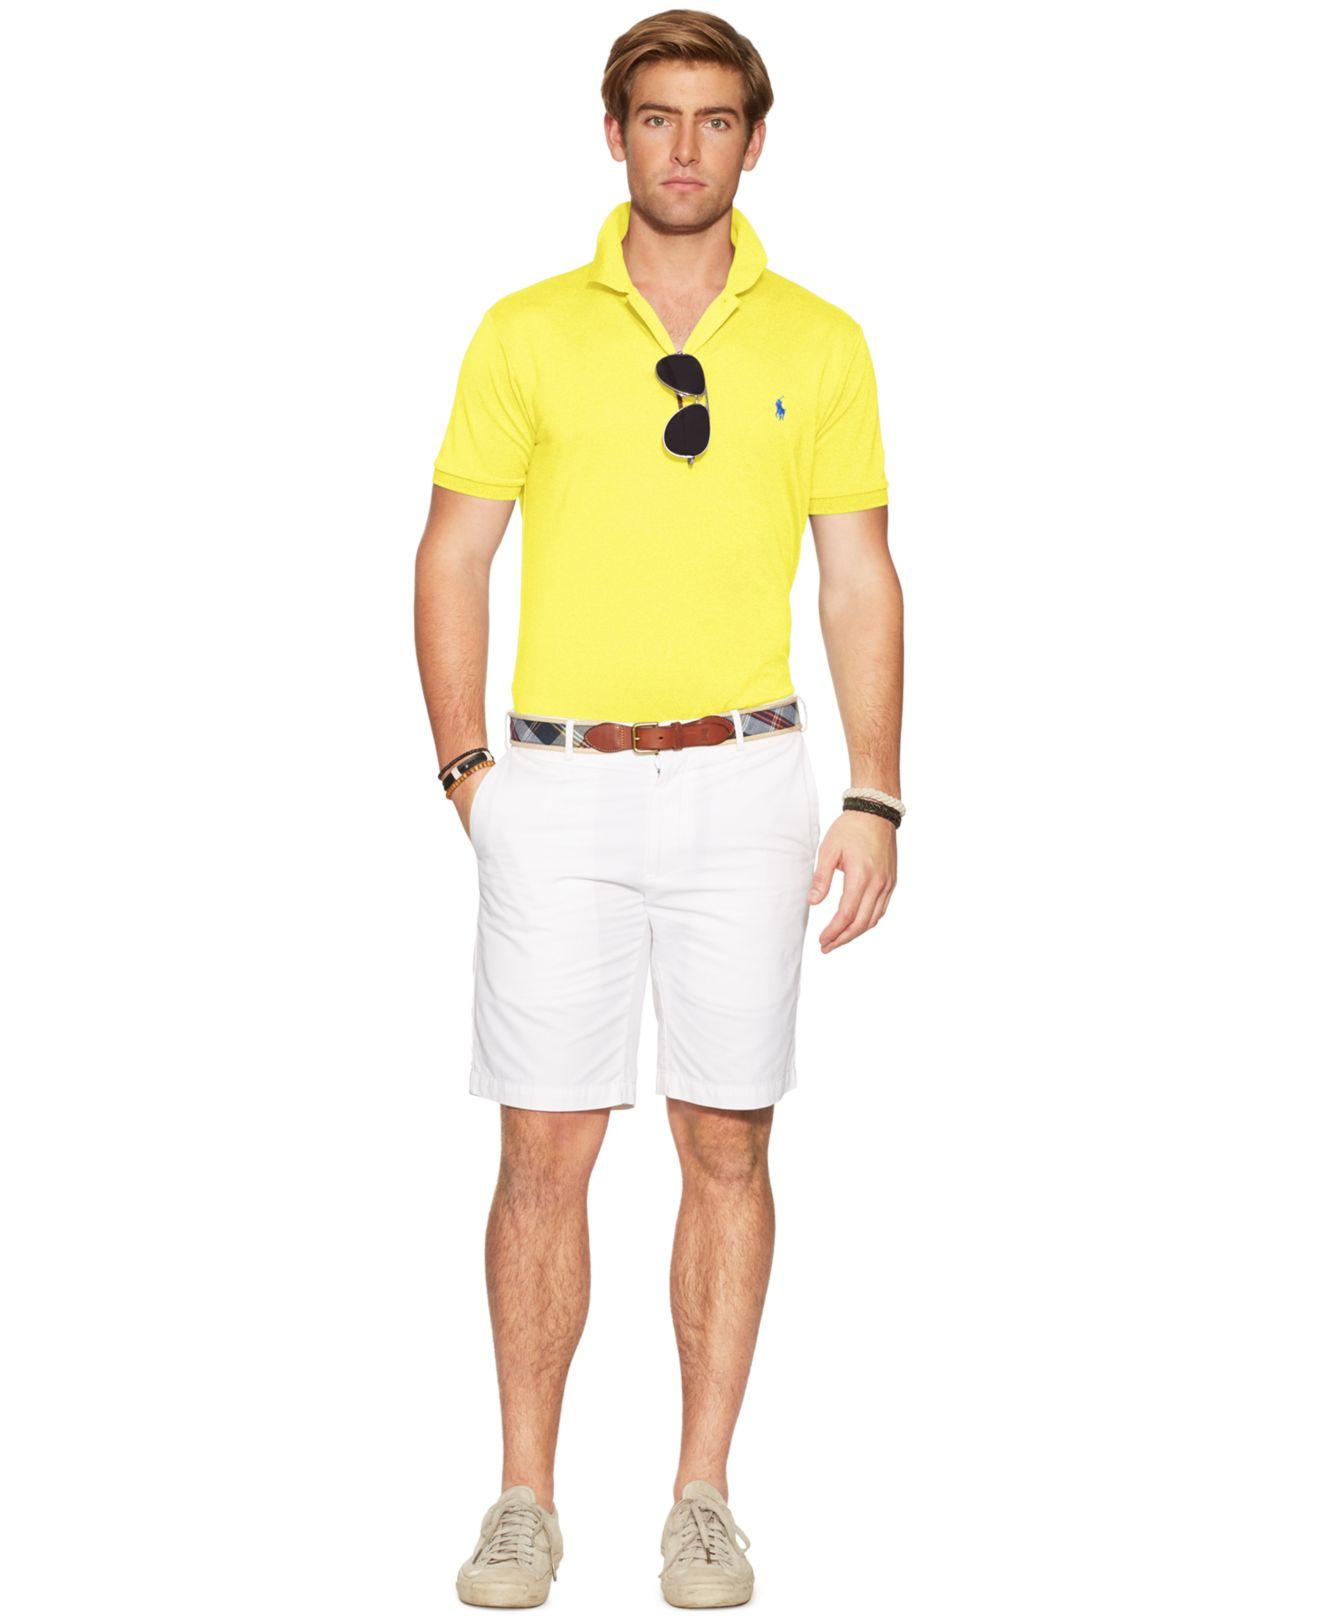 Polo ralph lauren Performance Mesh Polo Shirt in Yellow for Men (Lemon Crush) |